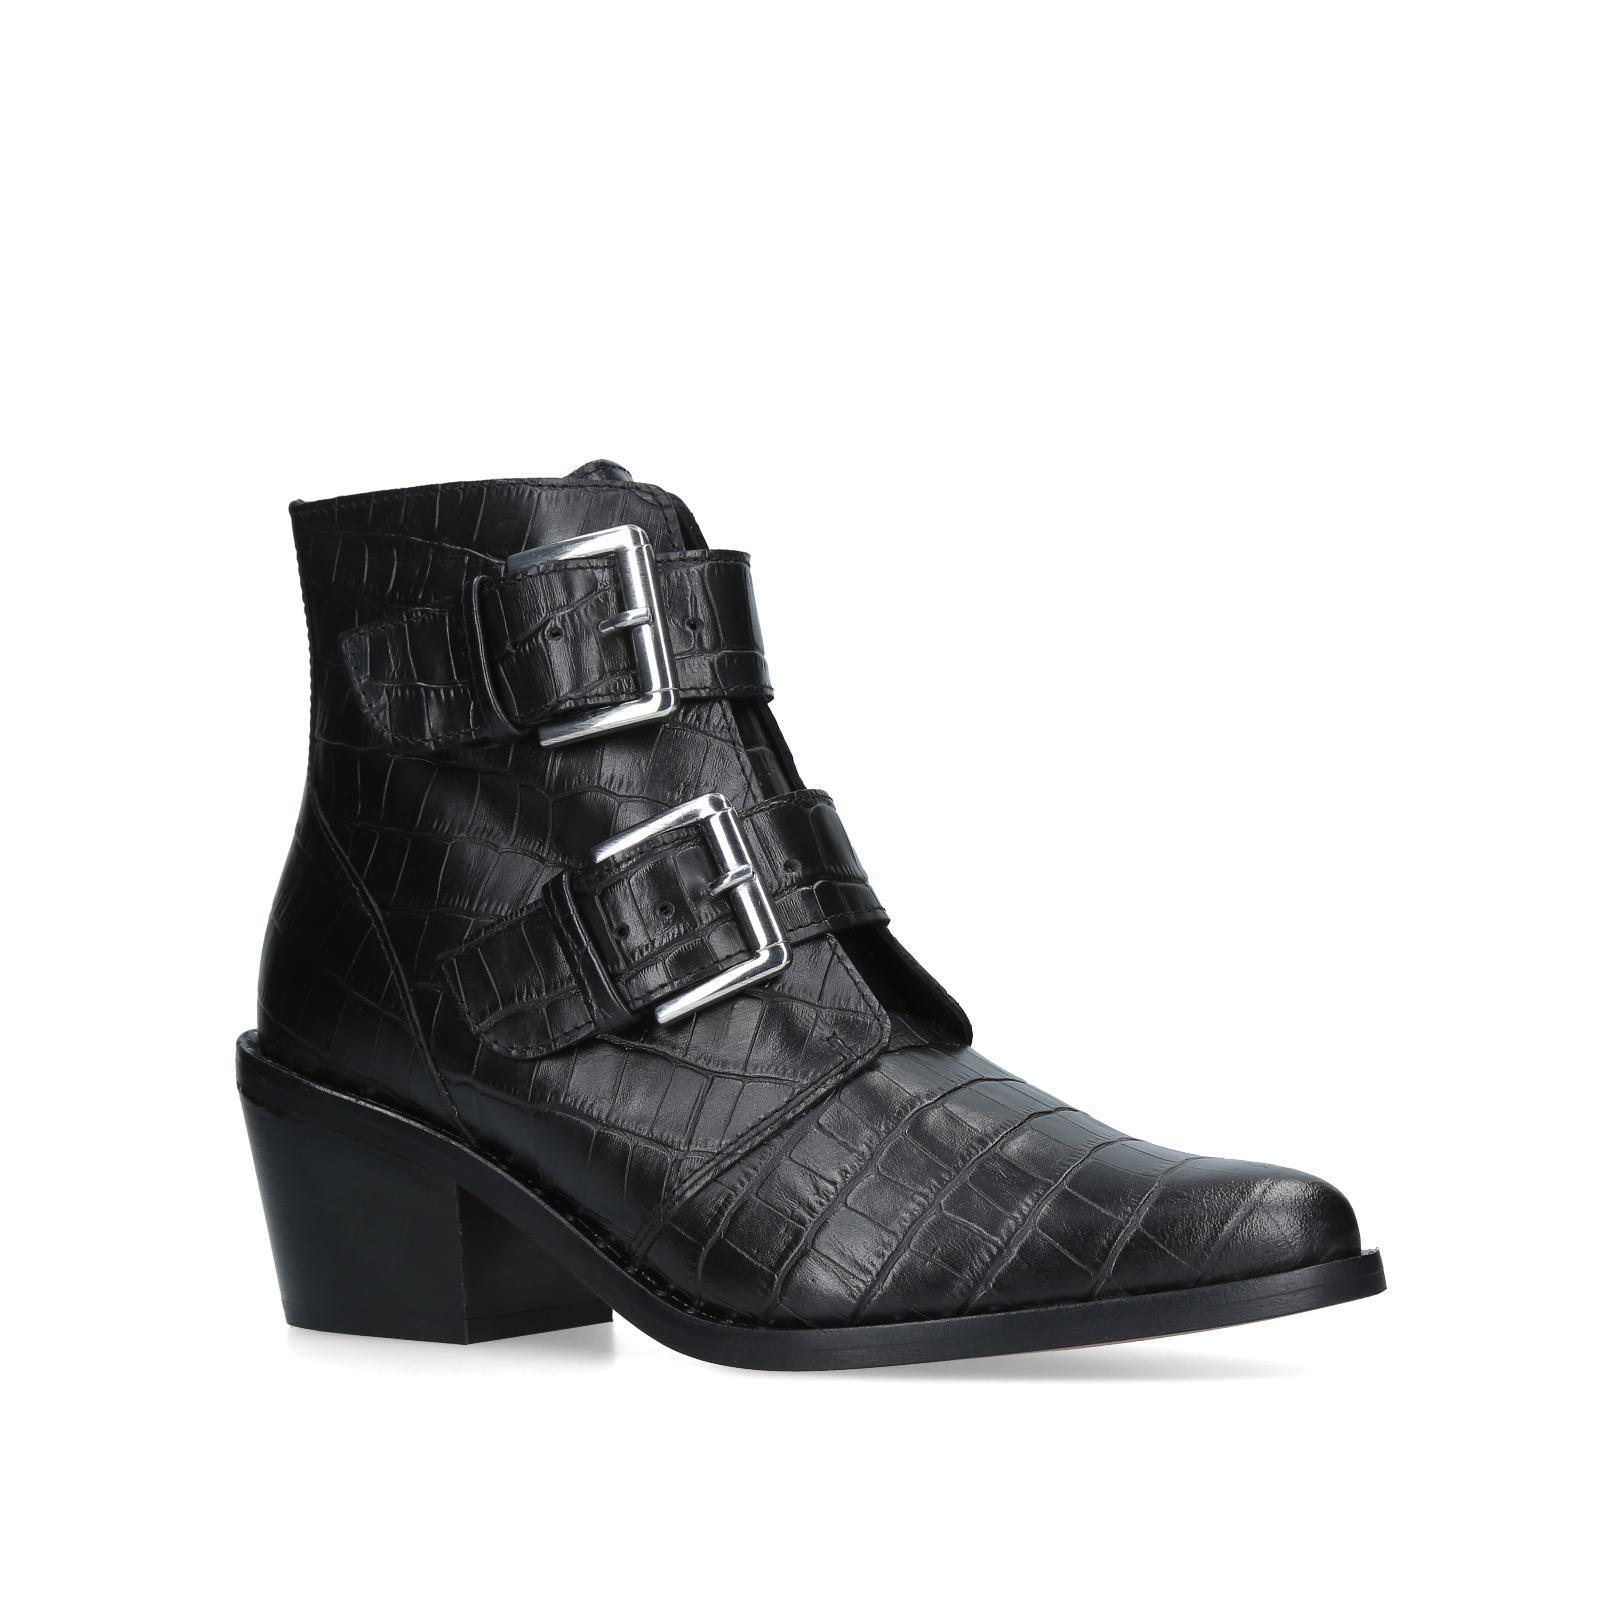 DENNY - KURT GEIGER LONDON Ankle Boots